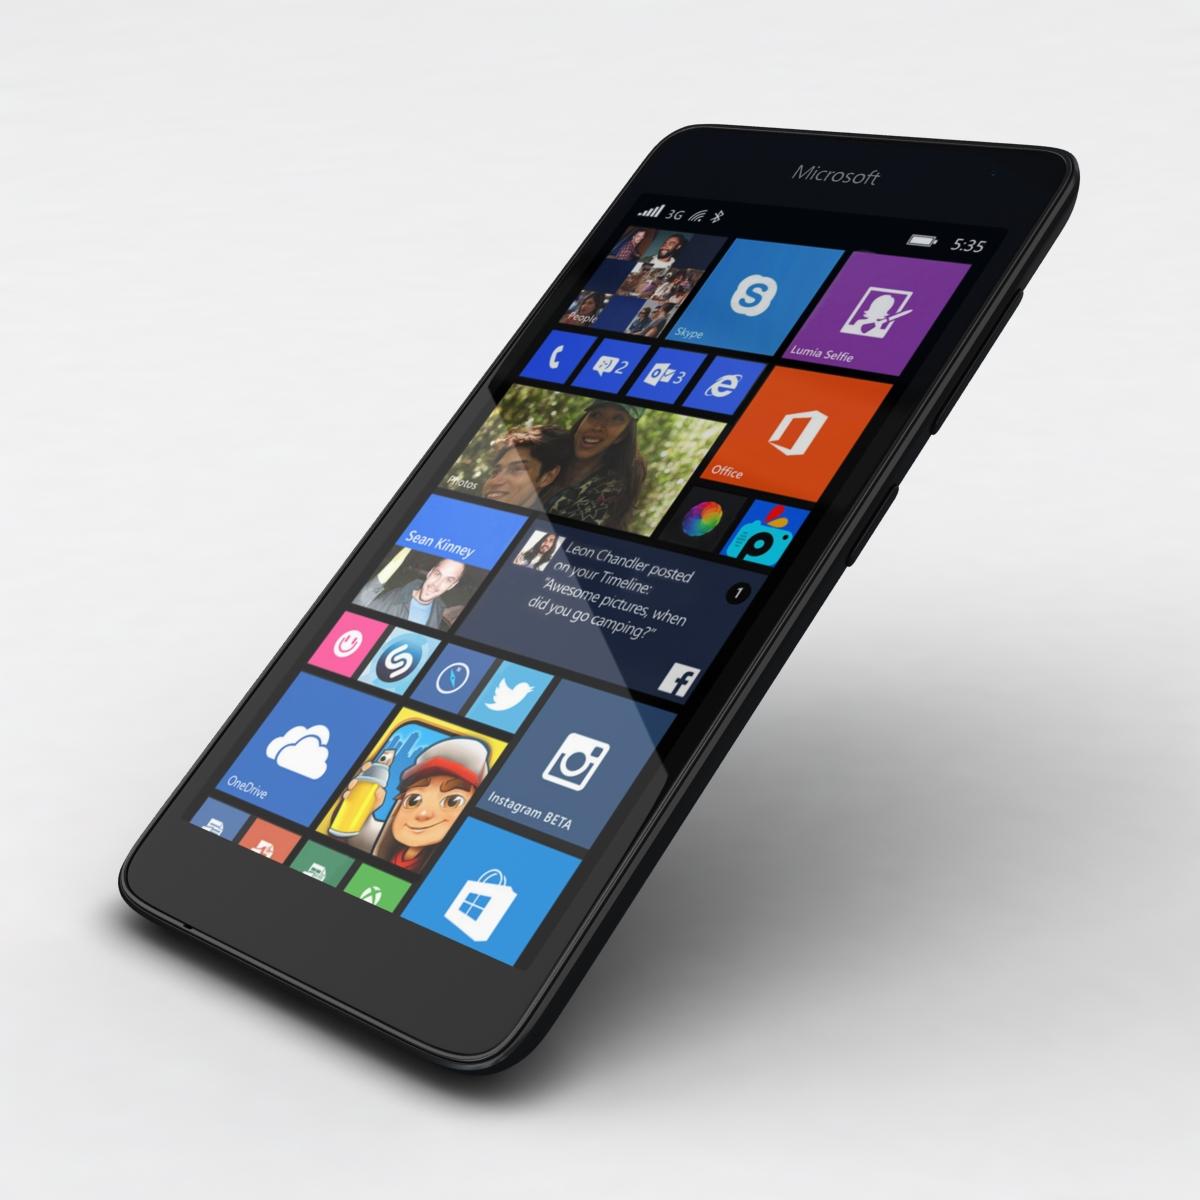 microsoft lumia 535 and dual sim black 3d model 3ds max fbx c4d obj 204362